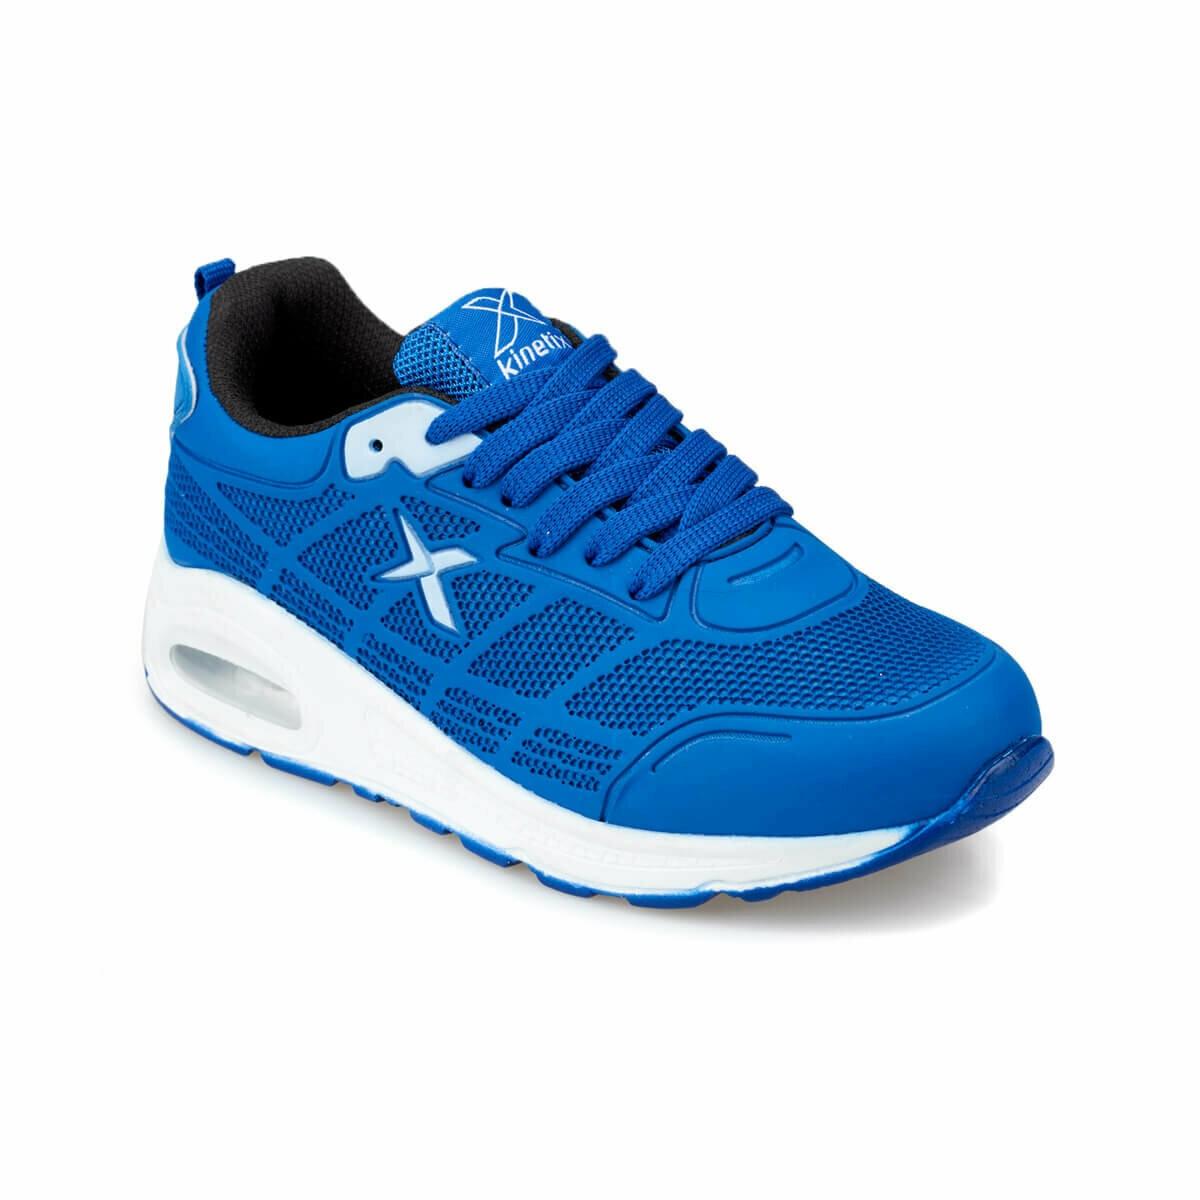 FLO RORY Saks Male Child Sneaker Shoes KINETIX